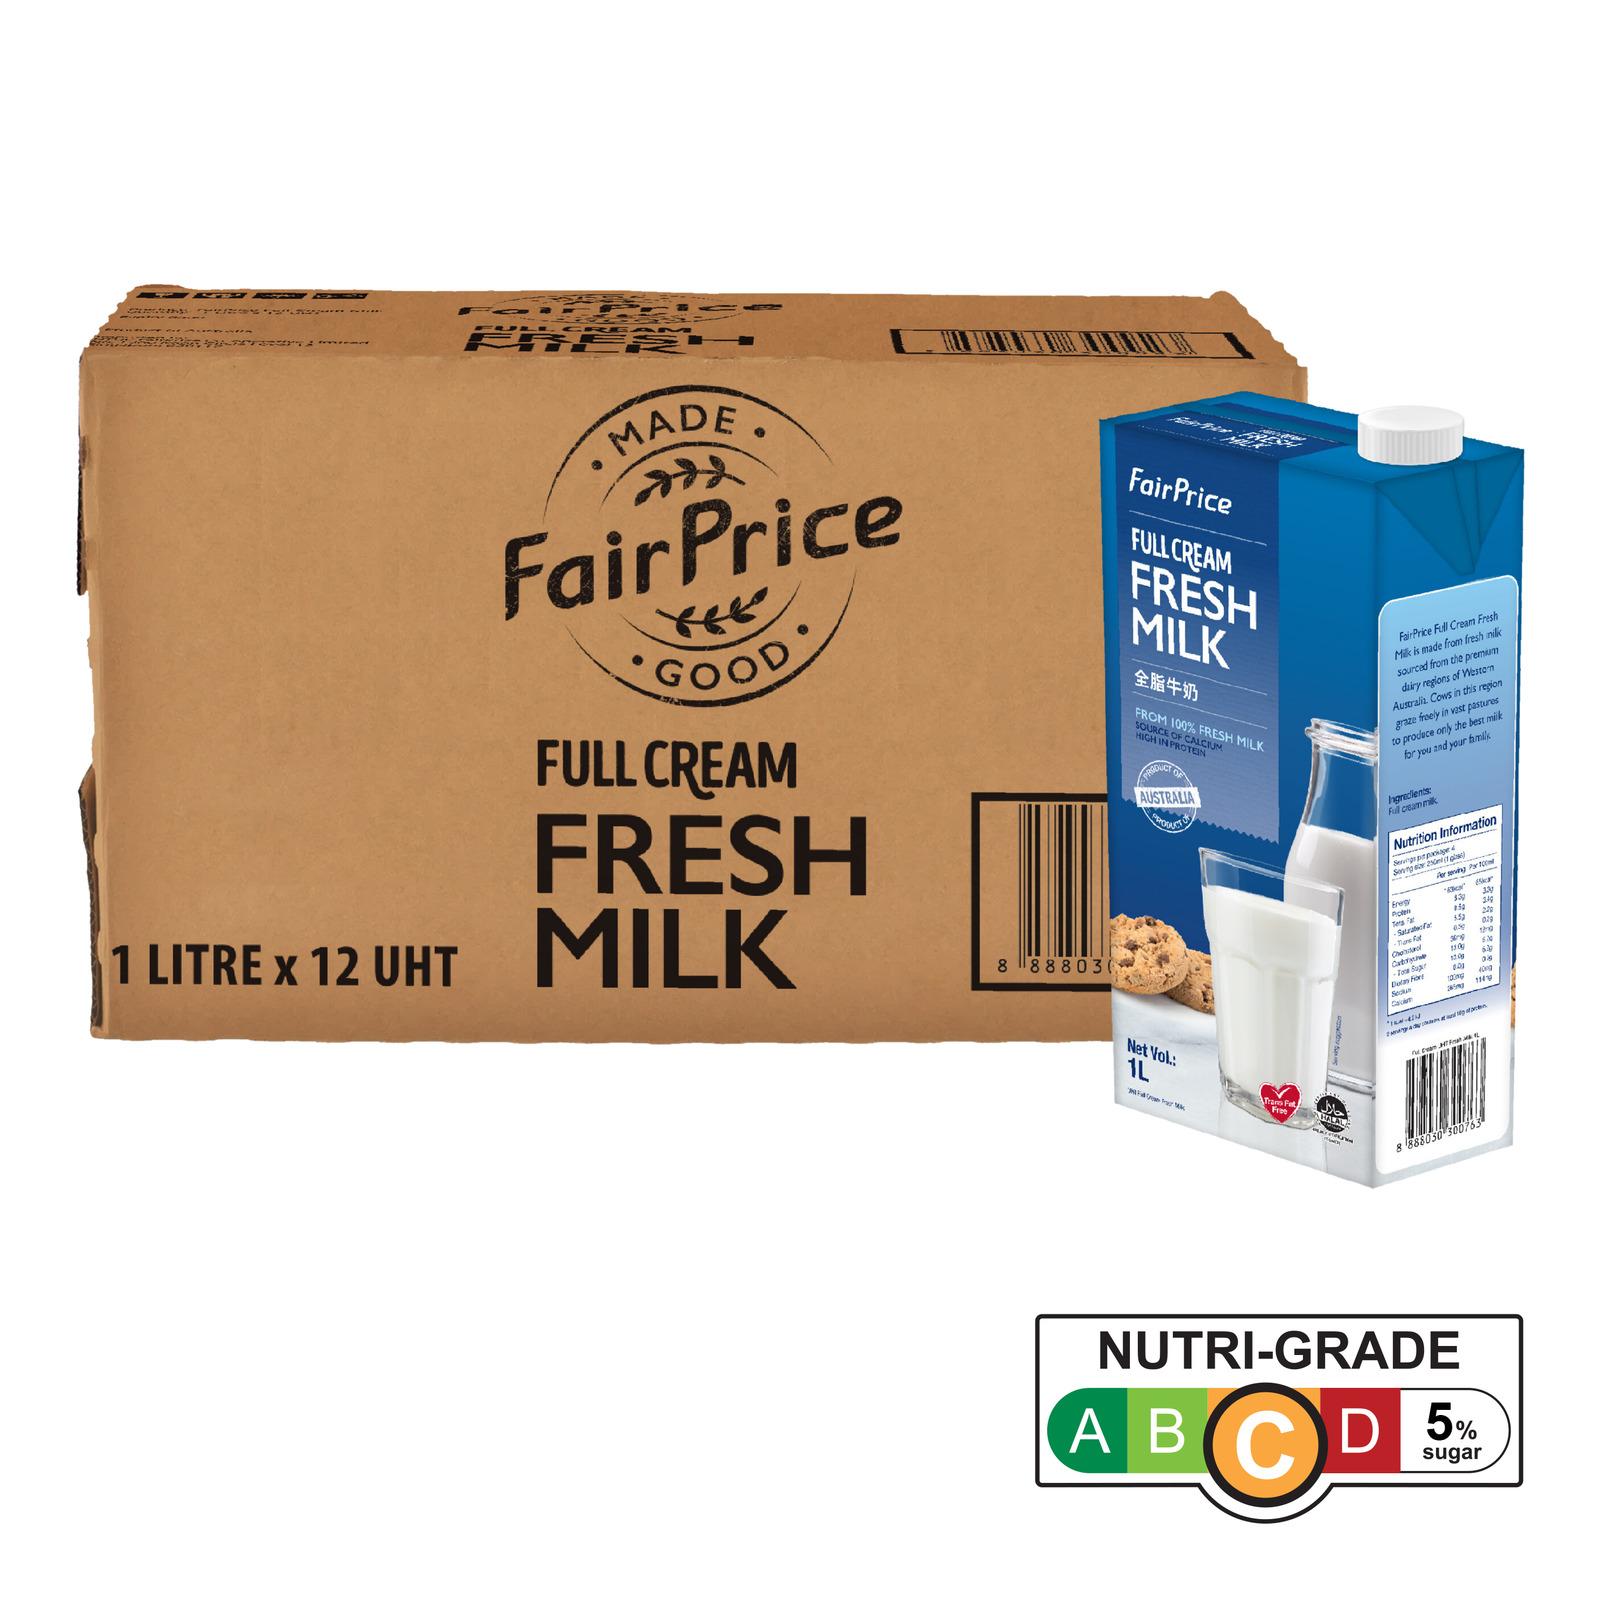 FairPrice UHT Milk - Full Cream